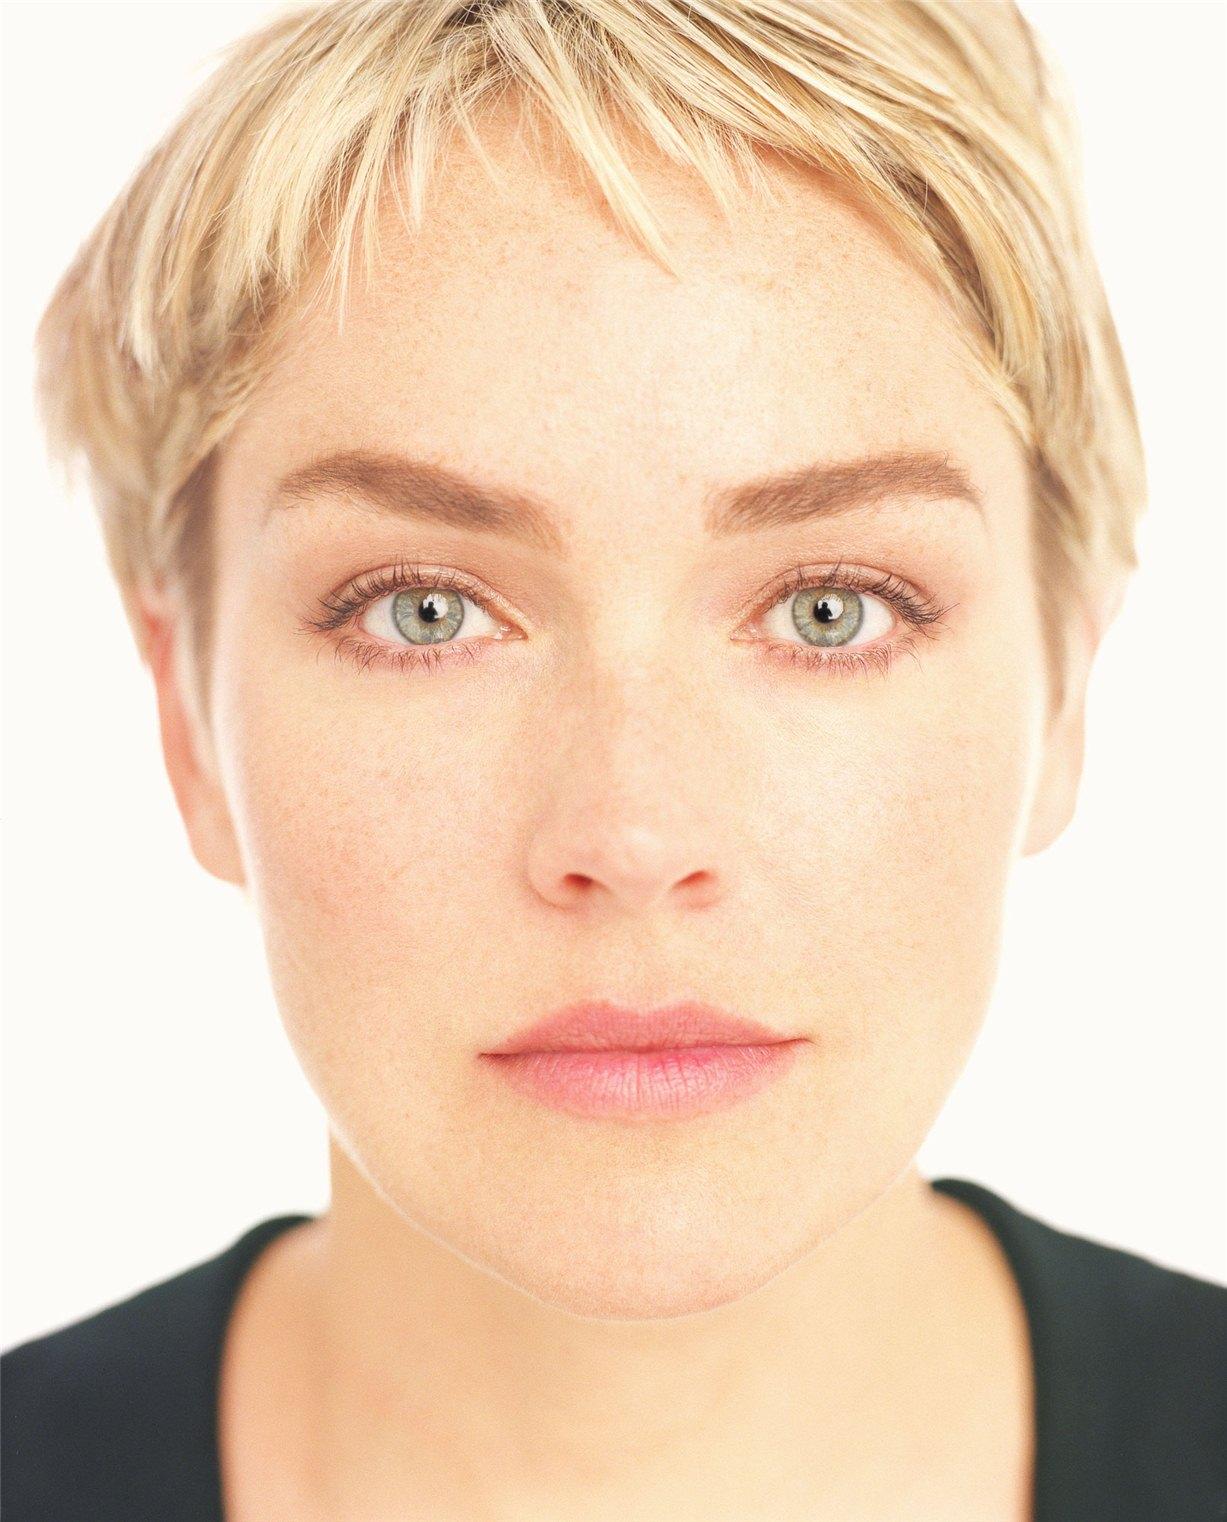 Sharon Stone / Шарон Стоун - звезды Голливуда, фотограф Firooz Zahedi